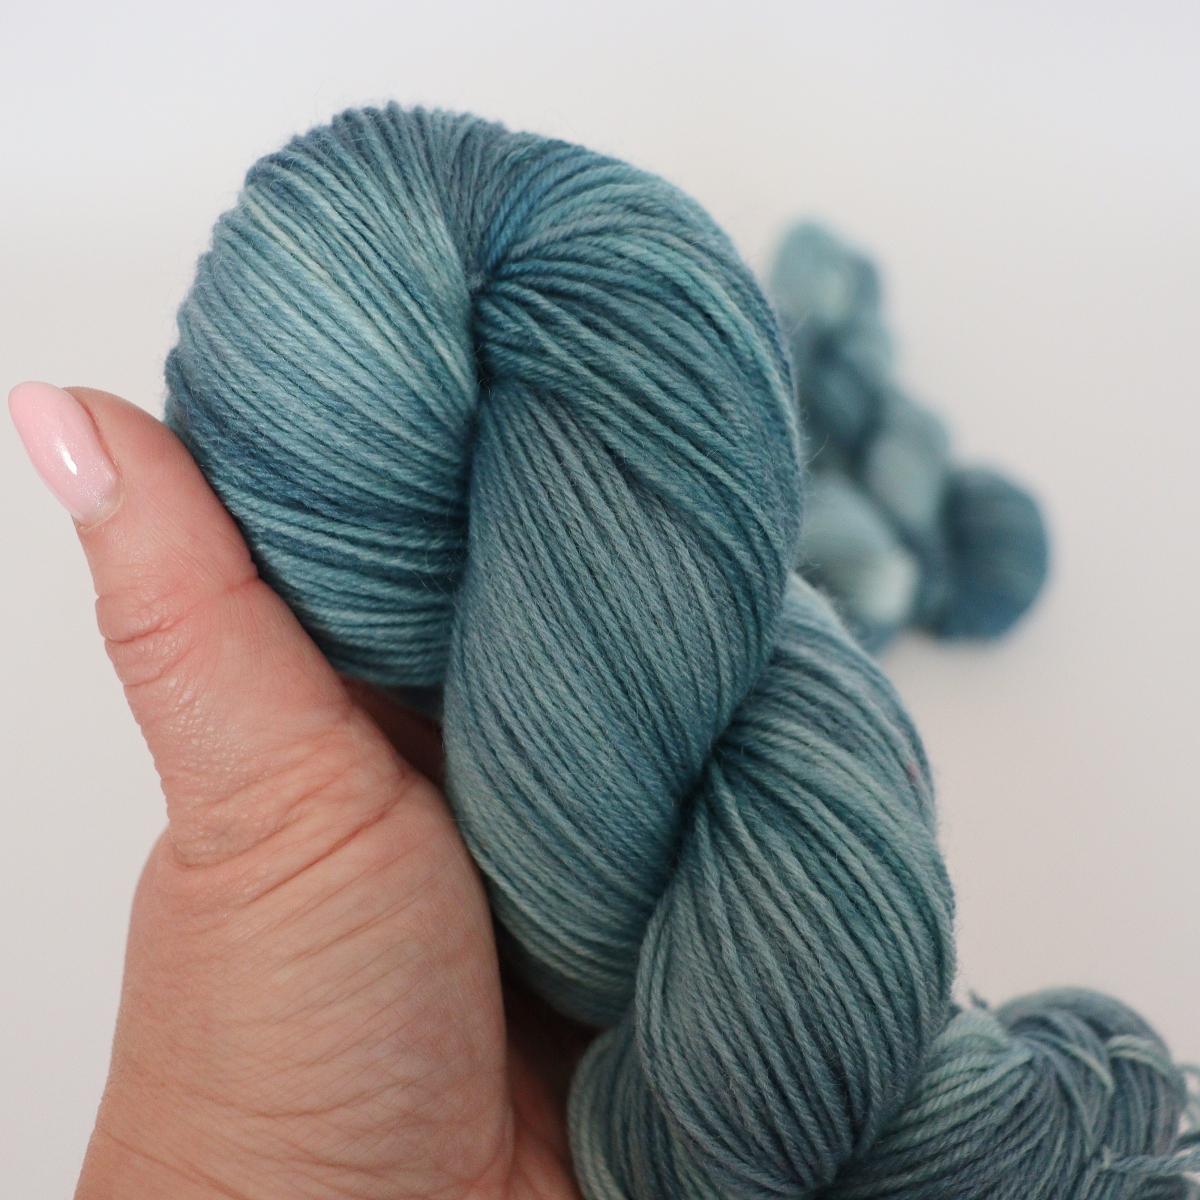 woodico.pro hand dyed yarn 066 1 1200x1200 - Hand dyed yarn / 066